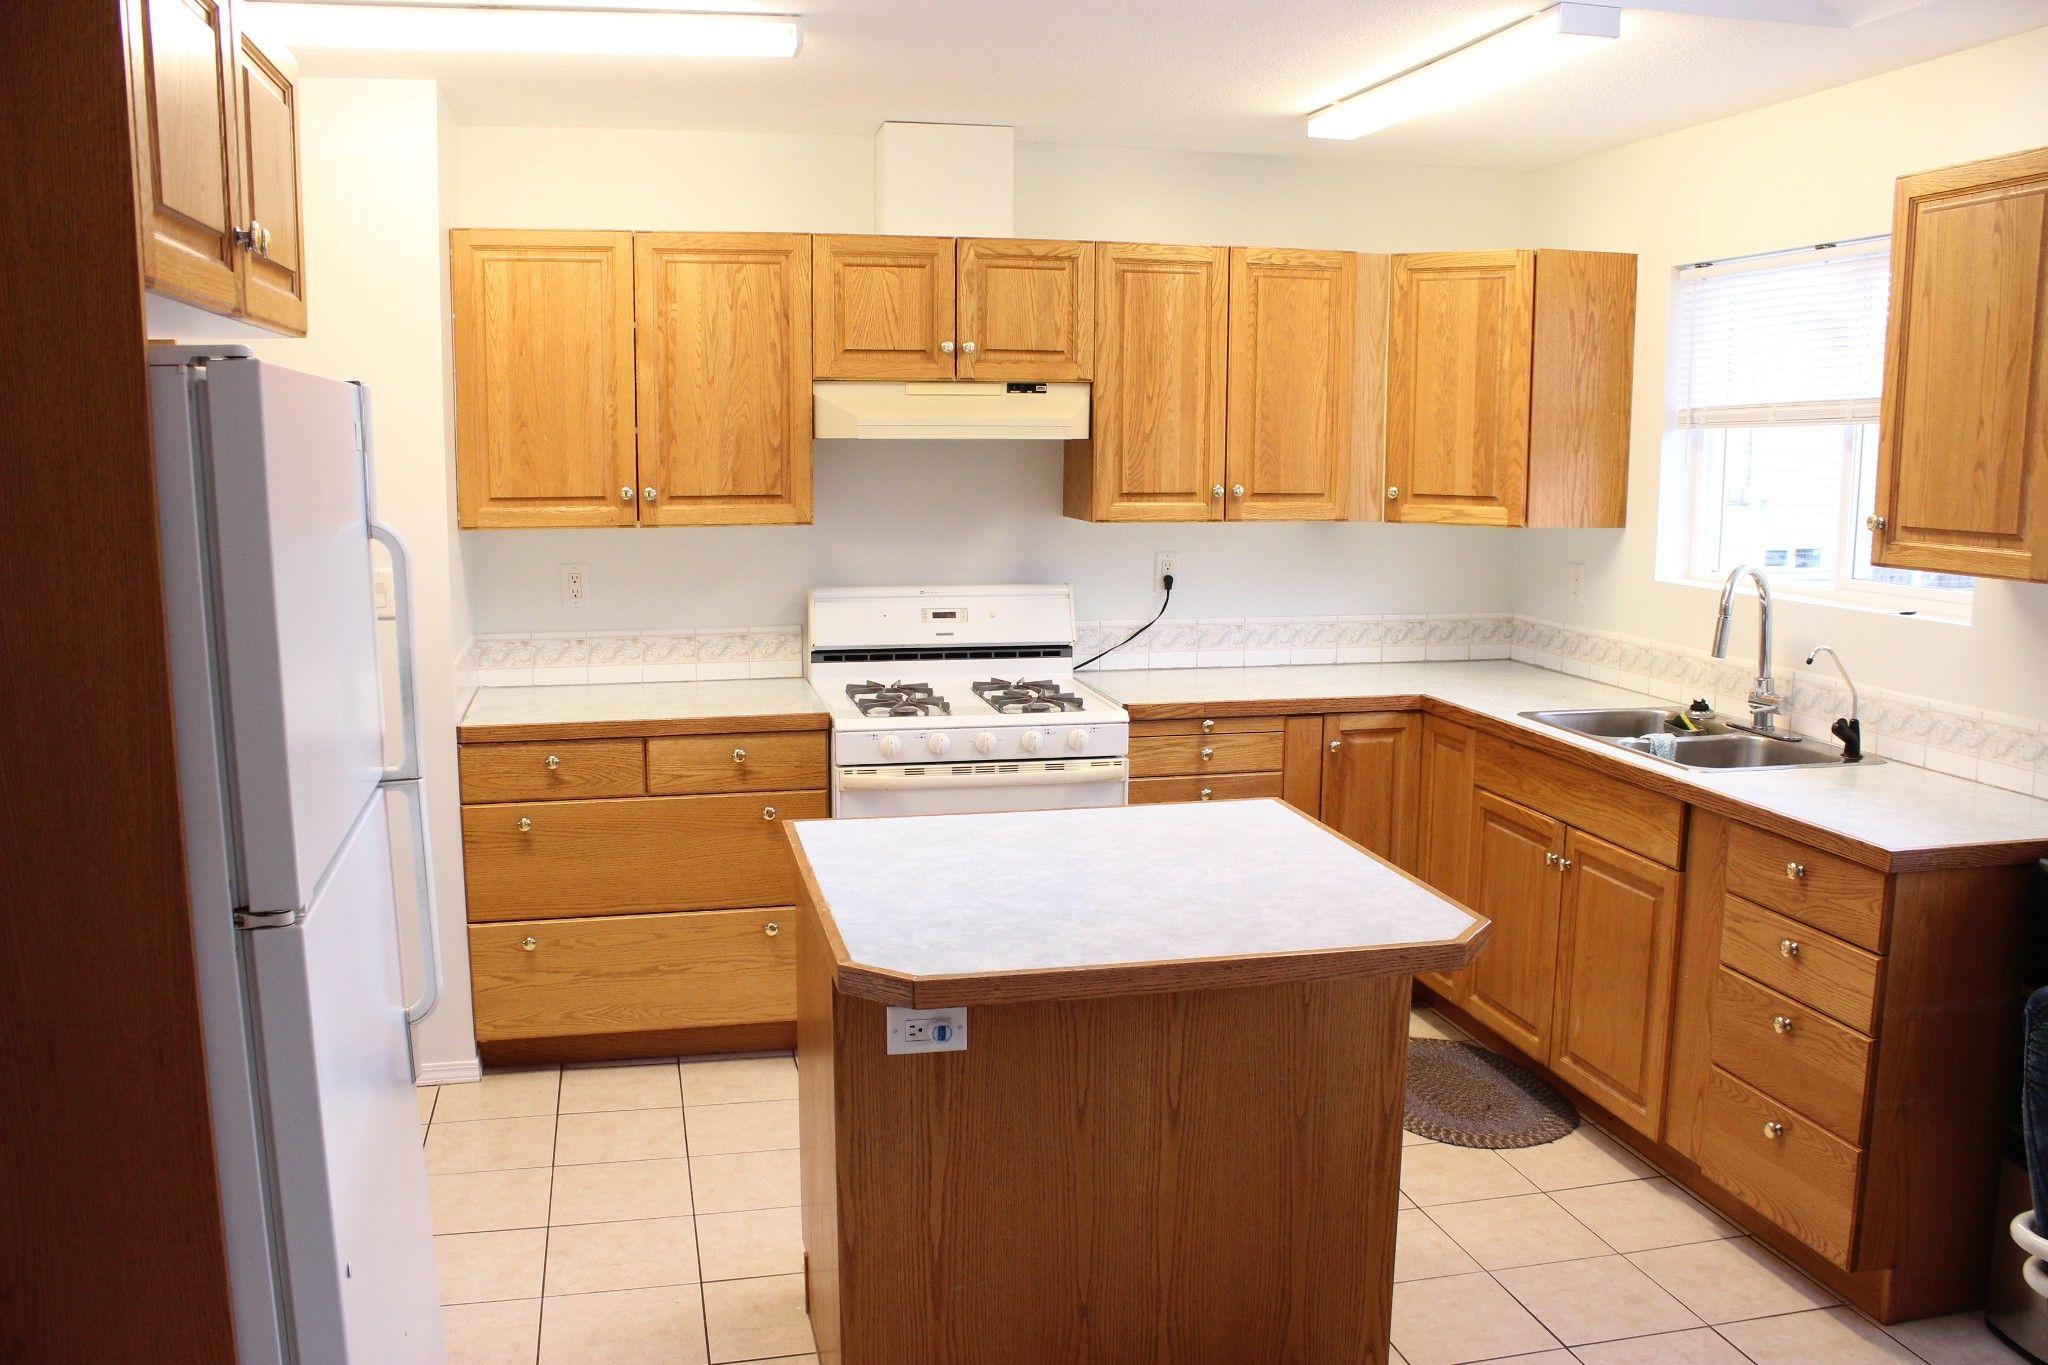 Photo 5: Photos: 6725 Heffley Road in Kamloops: Heffley House for sale : MLS®# 160007